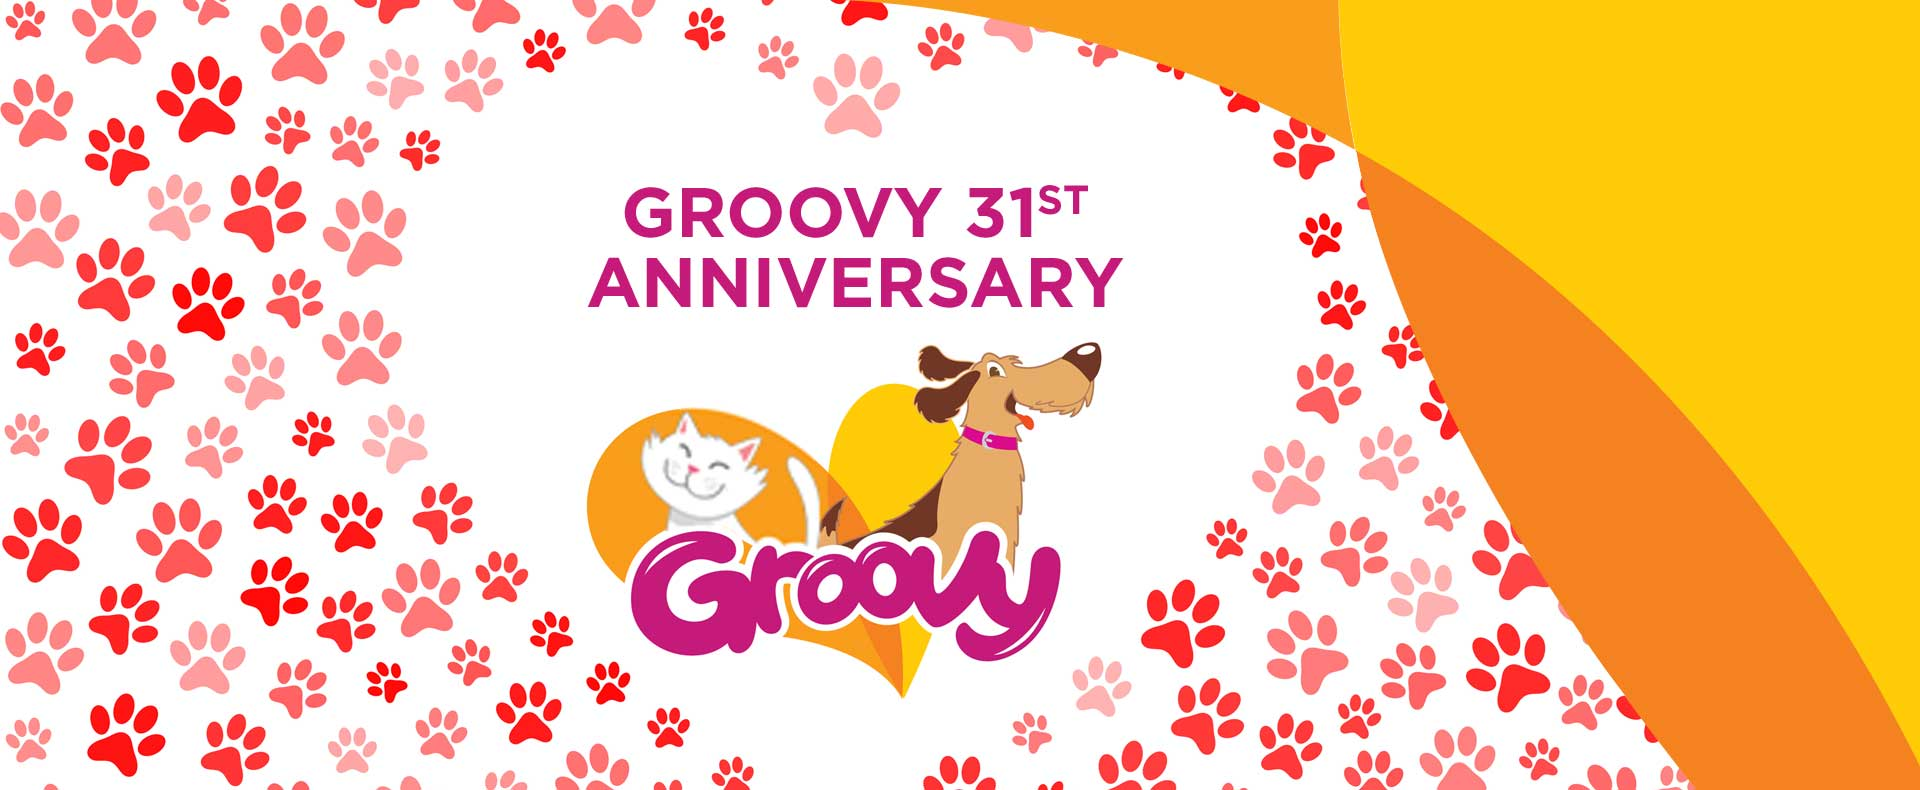 Groovy 31st Anniversary